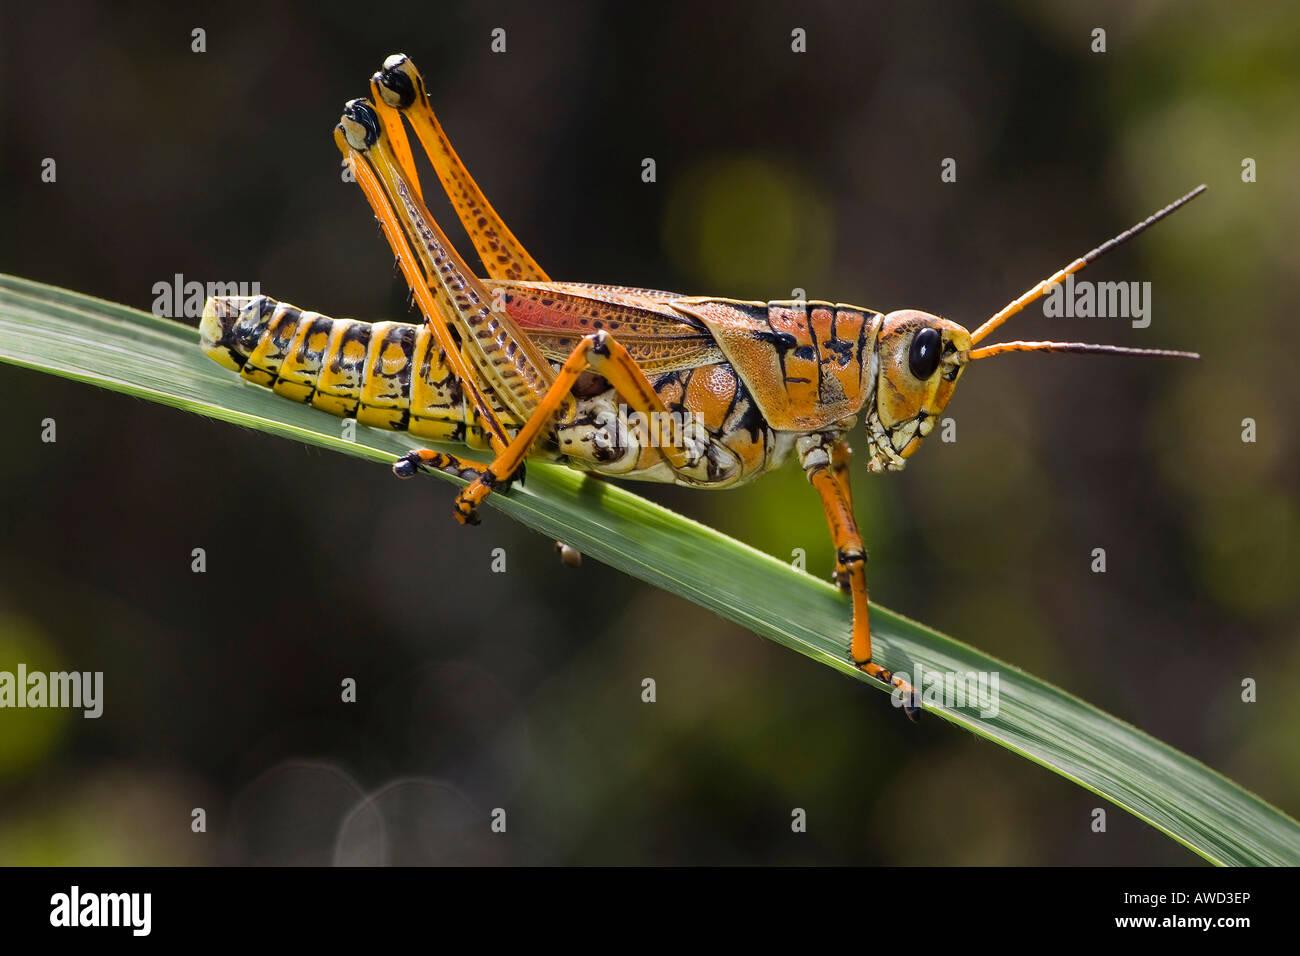 Ebenen Lümmel Grasshopper (Brachystola Magna), Anhinga Trail, Everglades-Nationalpark, Florida, USA, Nordamerika Stockbild